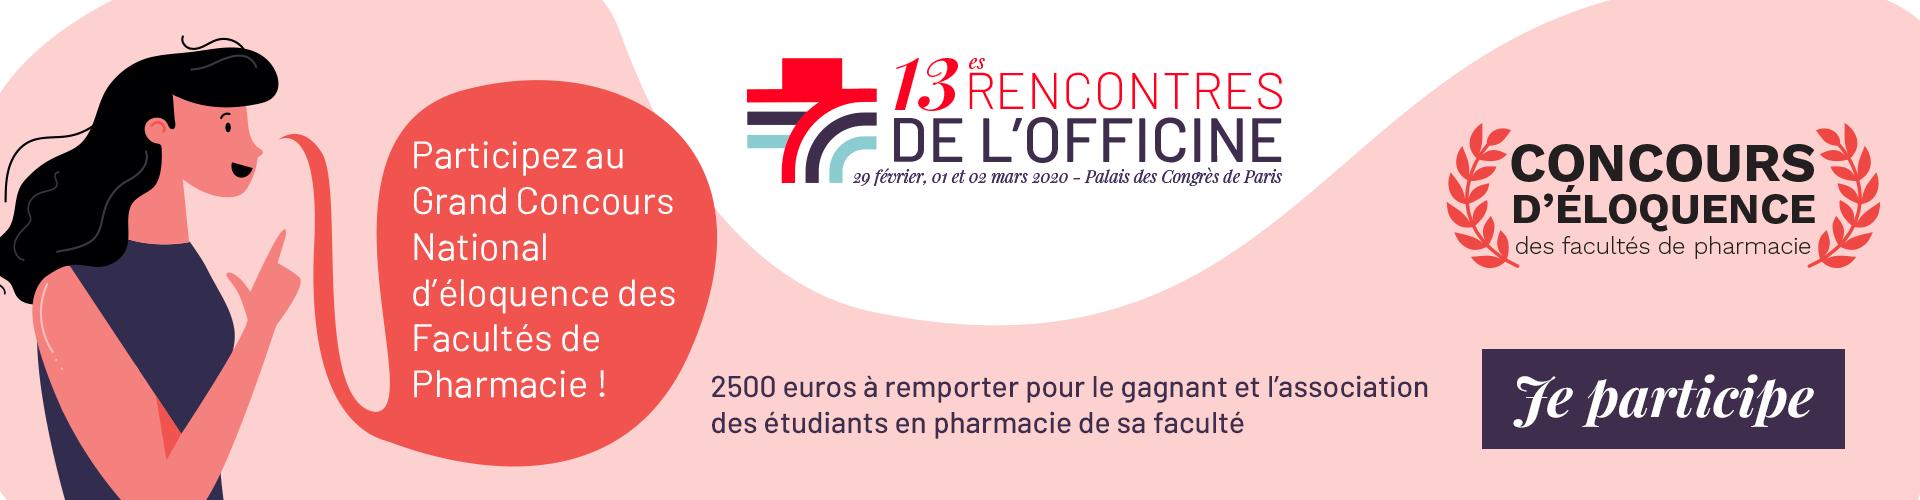 350 pharmacies